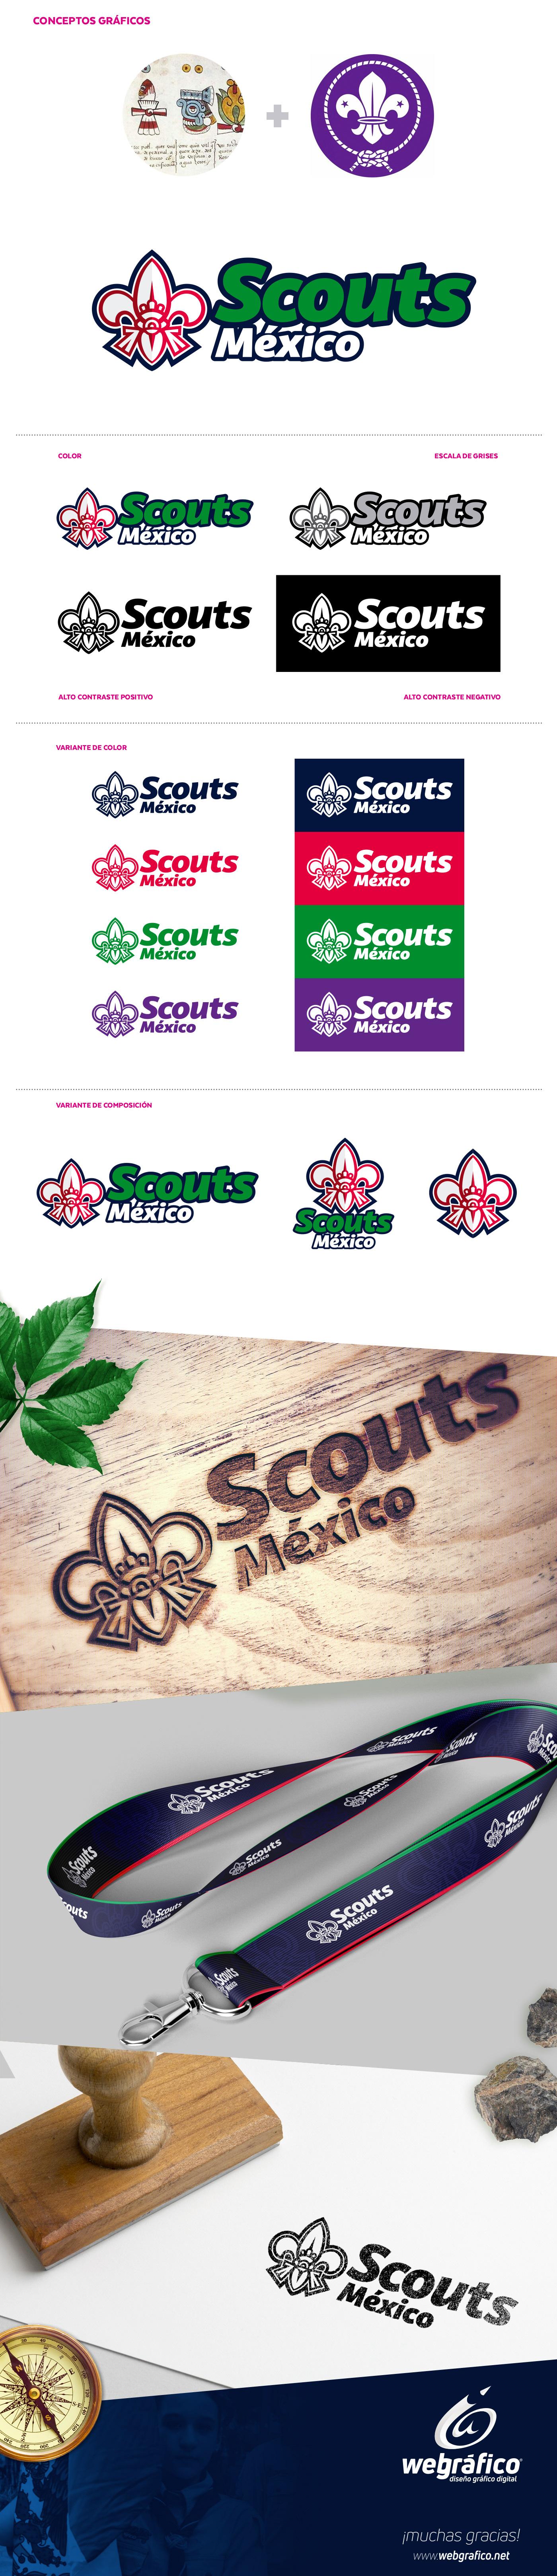 scout mexico aguascalientes webgrafico diseño identidad logo Logotipo scouts